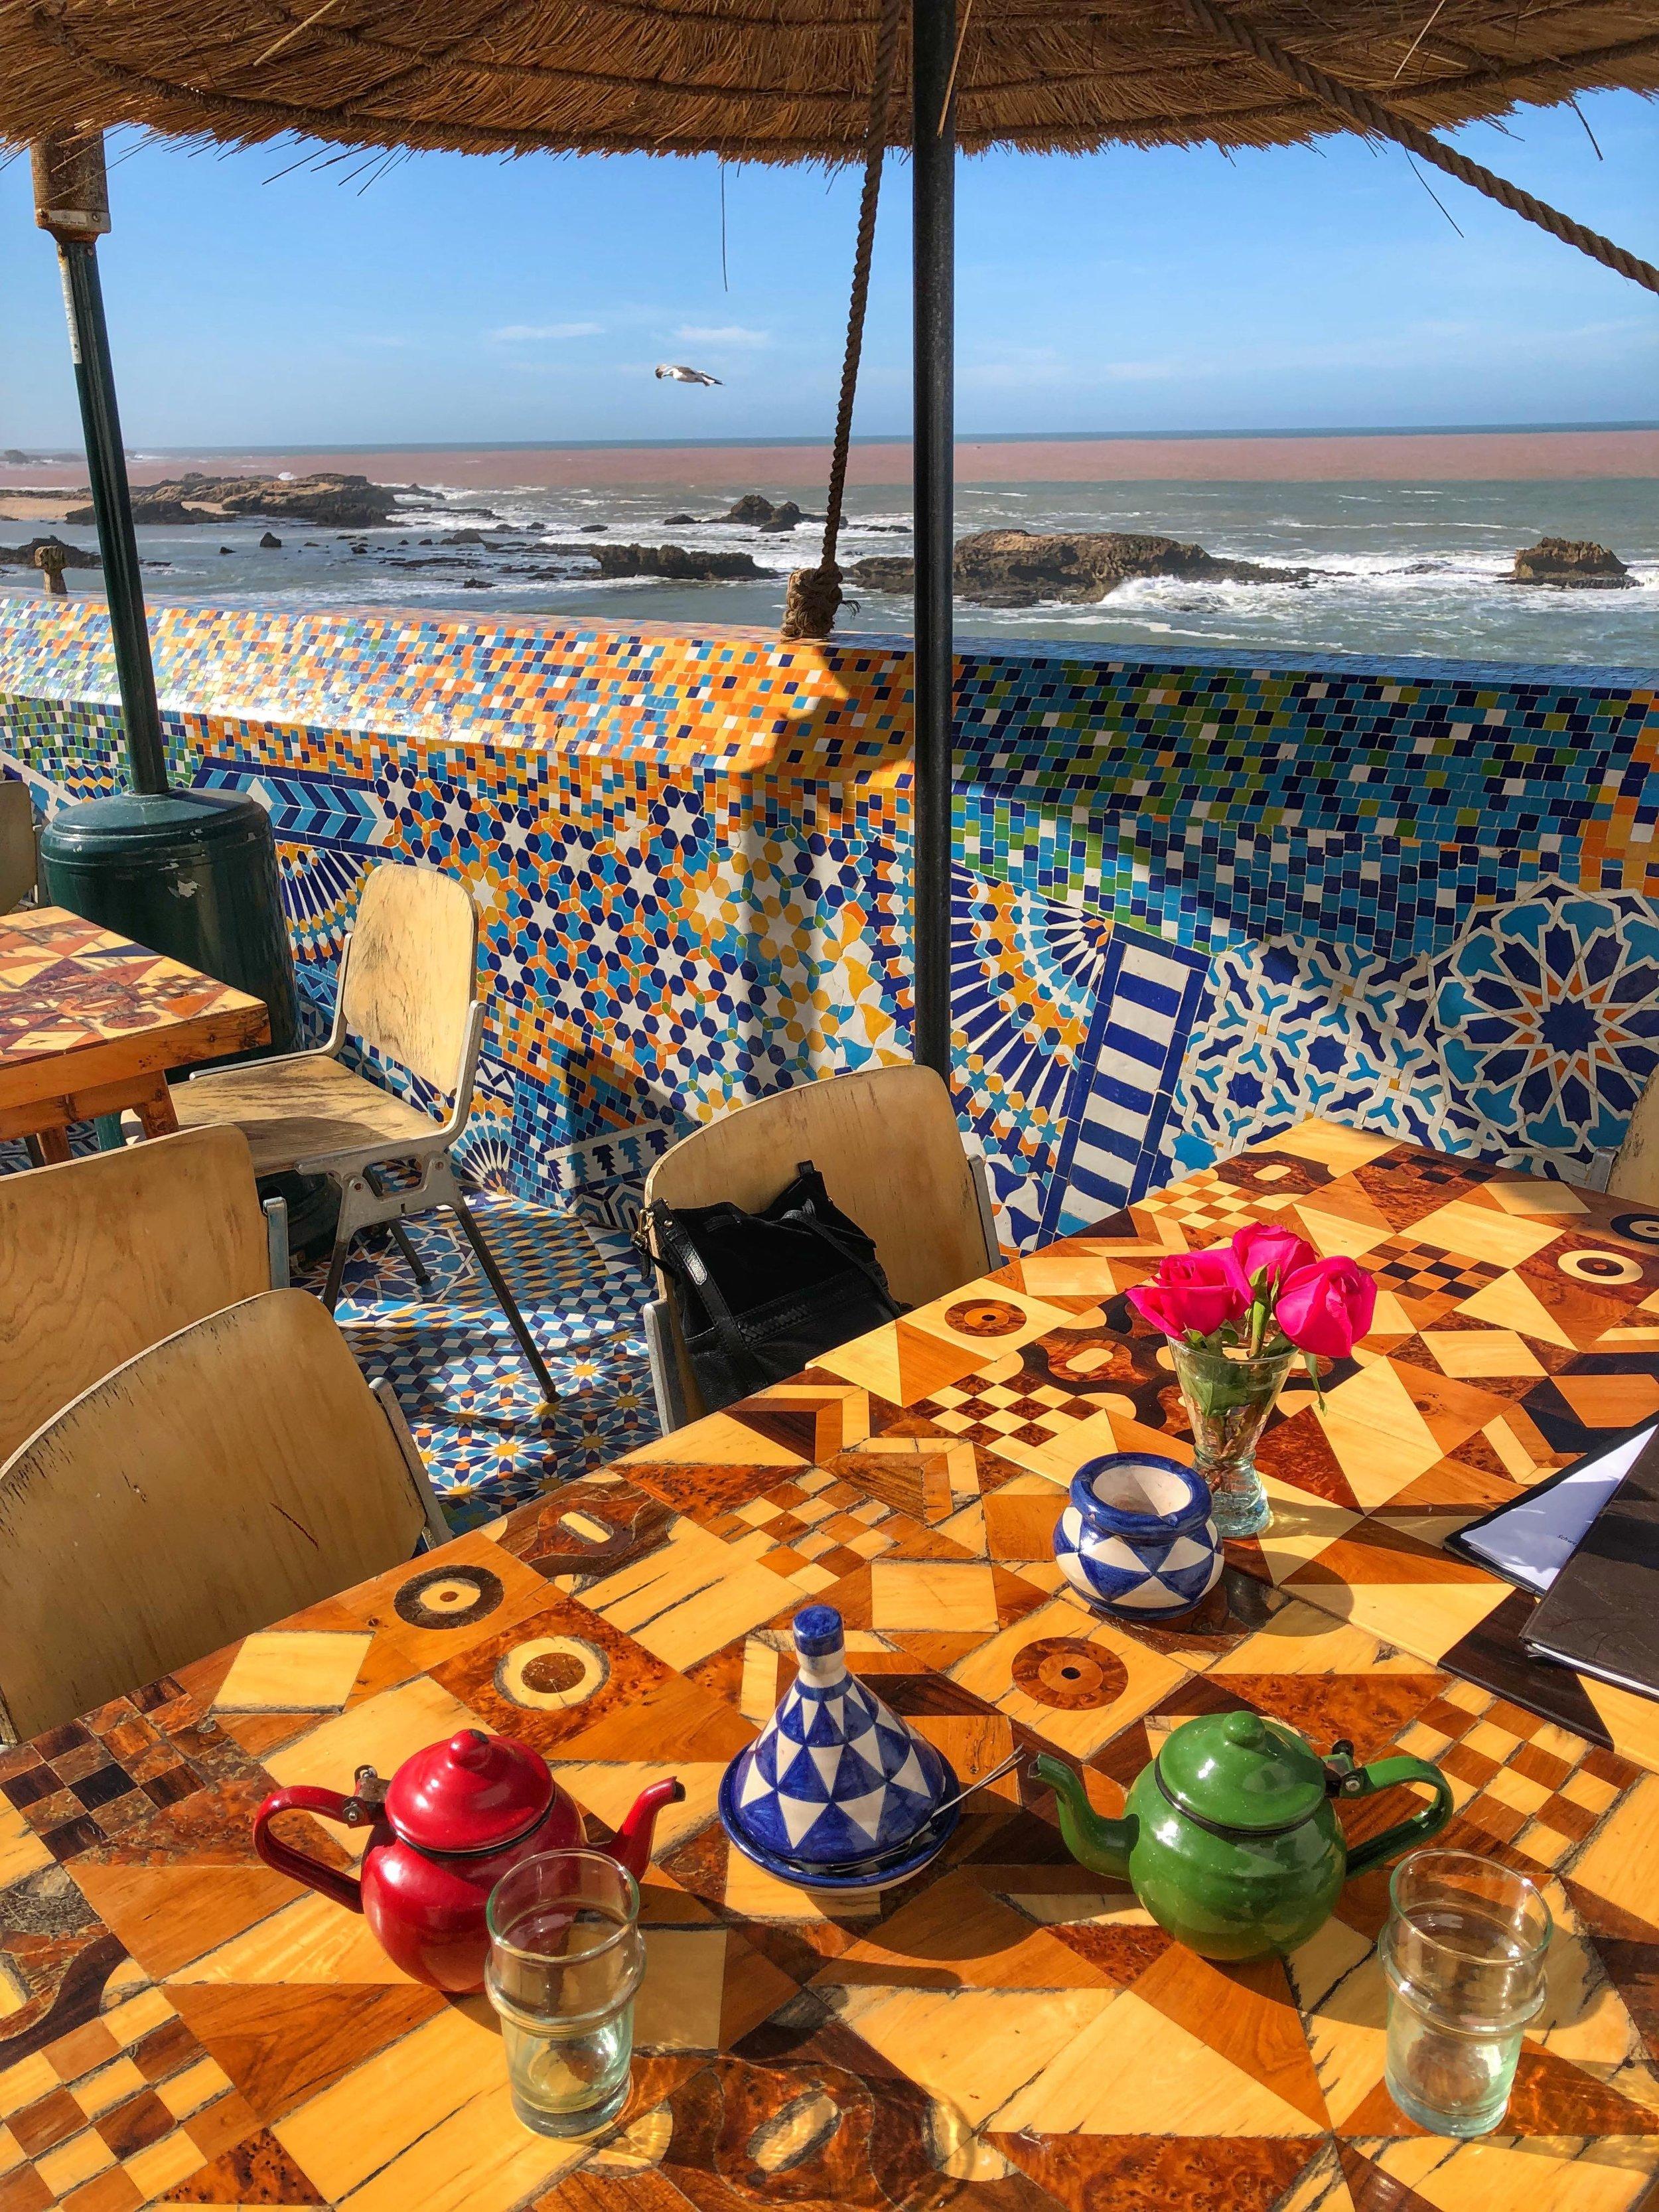 Essaouira for a day